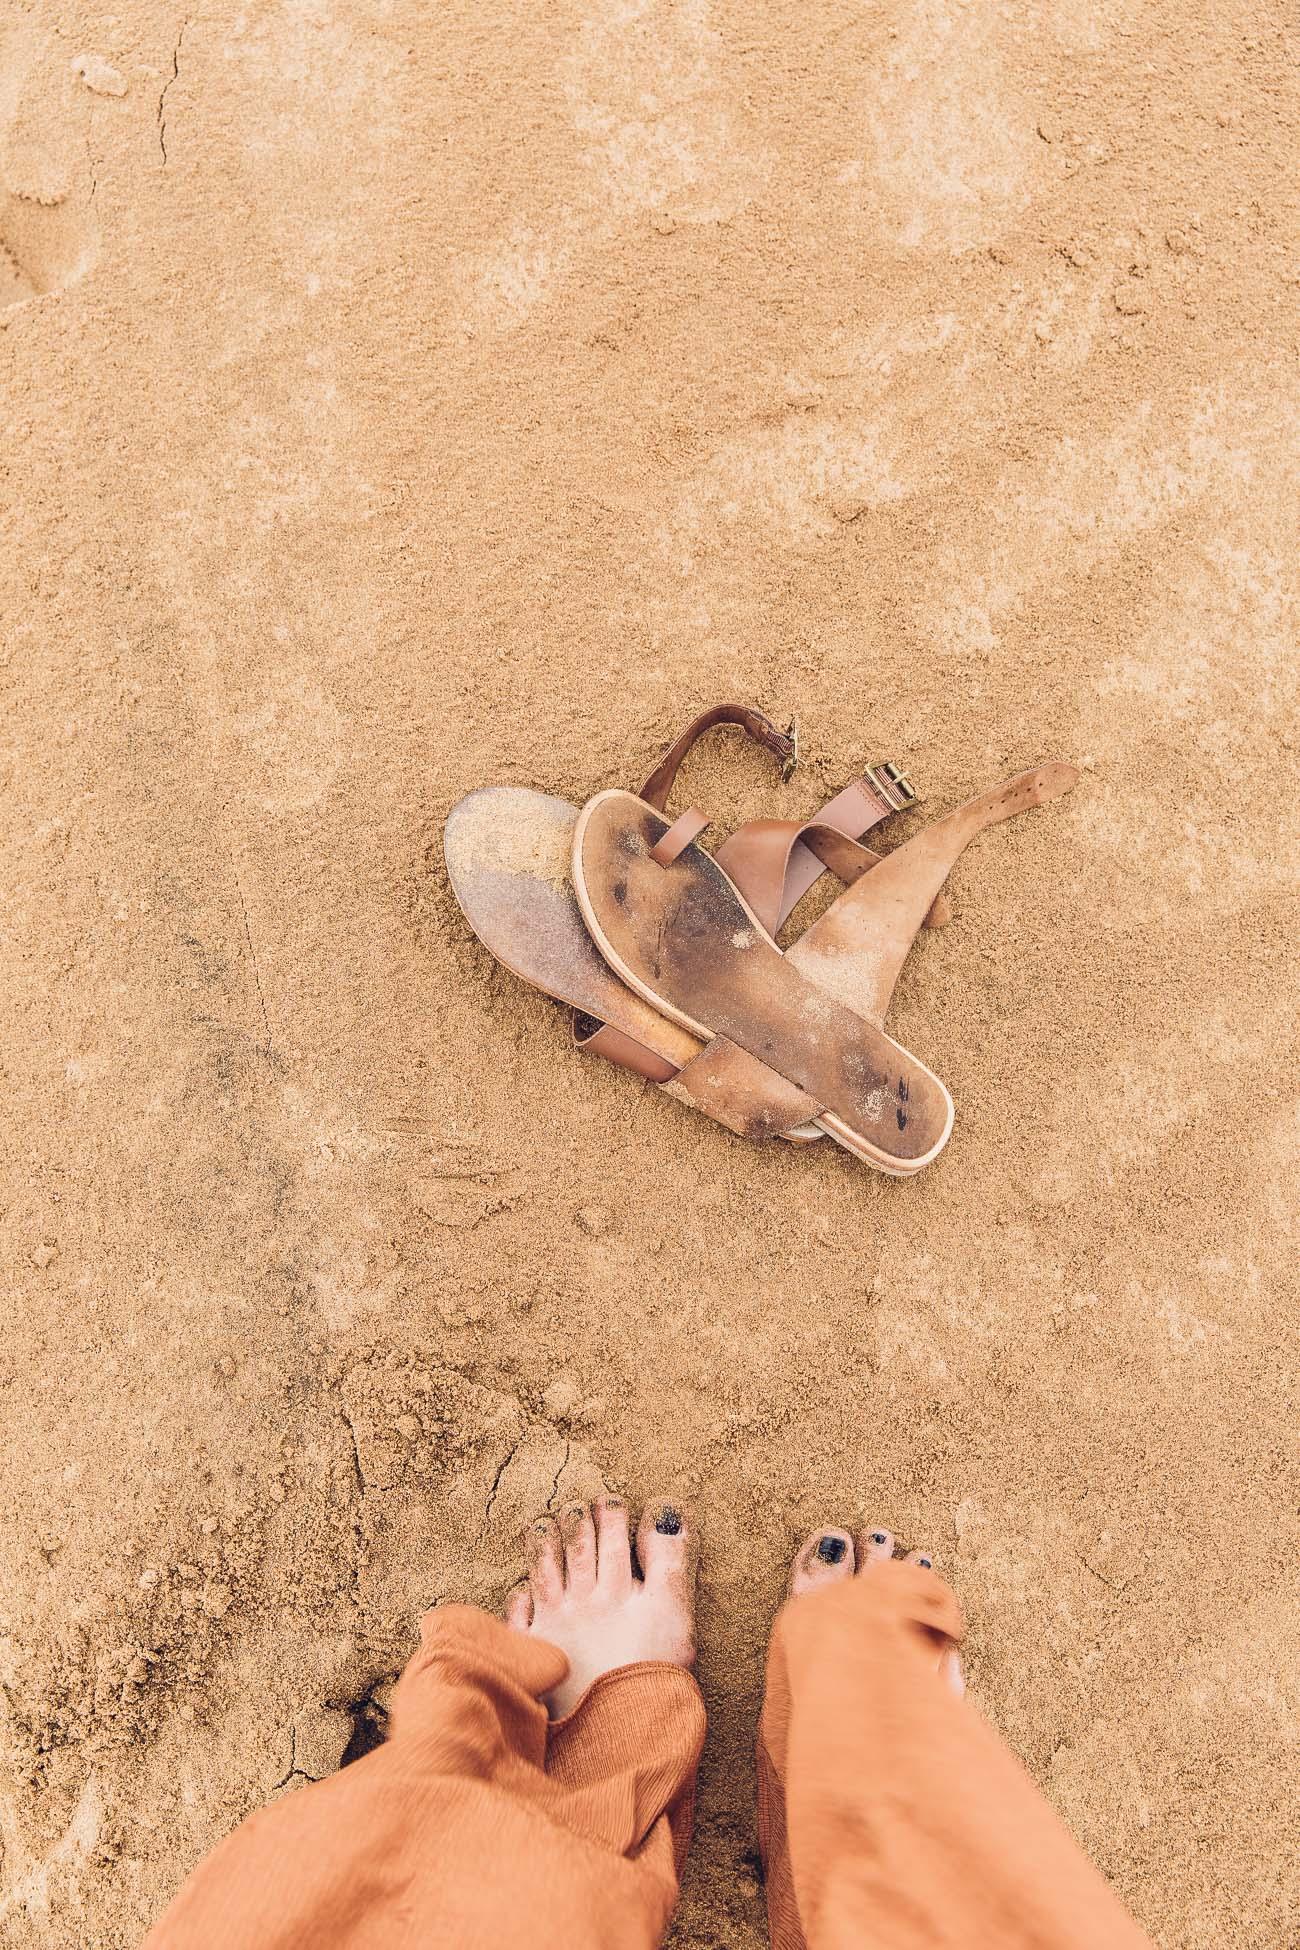 Dune 7 Swakopmund Walvis Bay Namibia